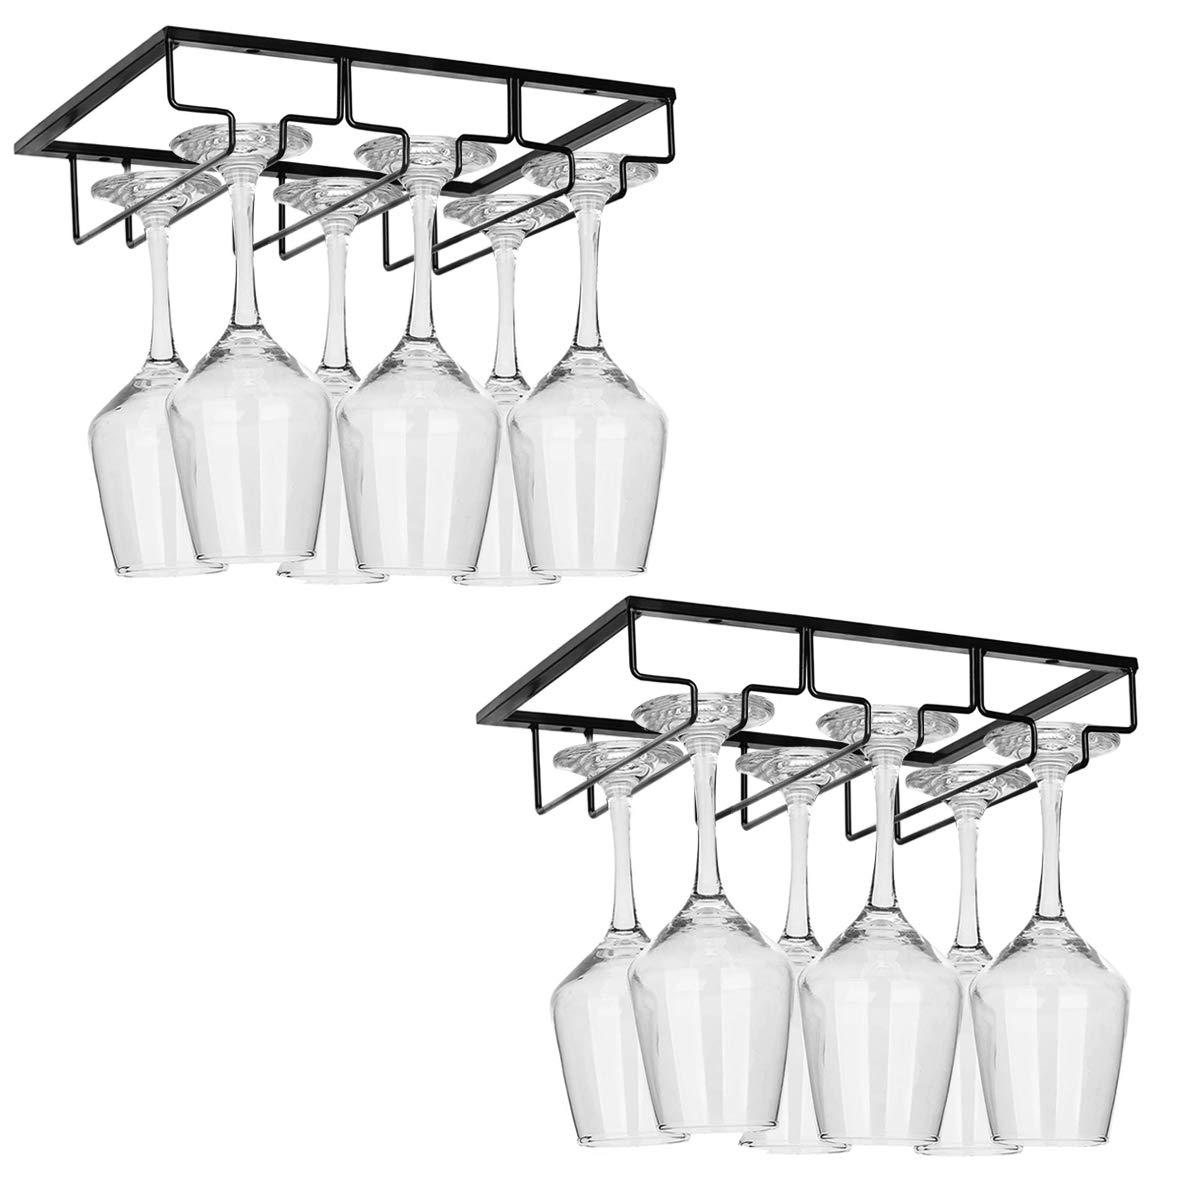 2 Pack Wine Glass Rack - 3 Rows Under Cabinet Stemware Wine Glass Holder Glasses Storage Hanger Metal Organizer for Bar,Kitchen,Black by Qmiracle